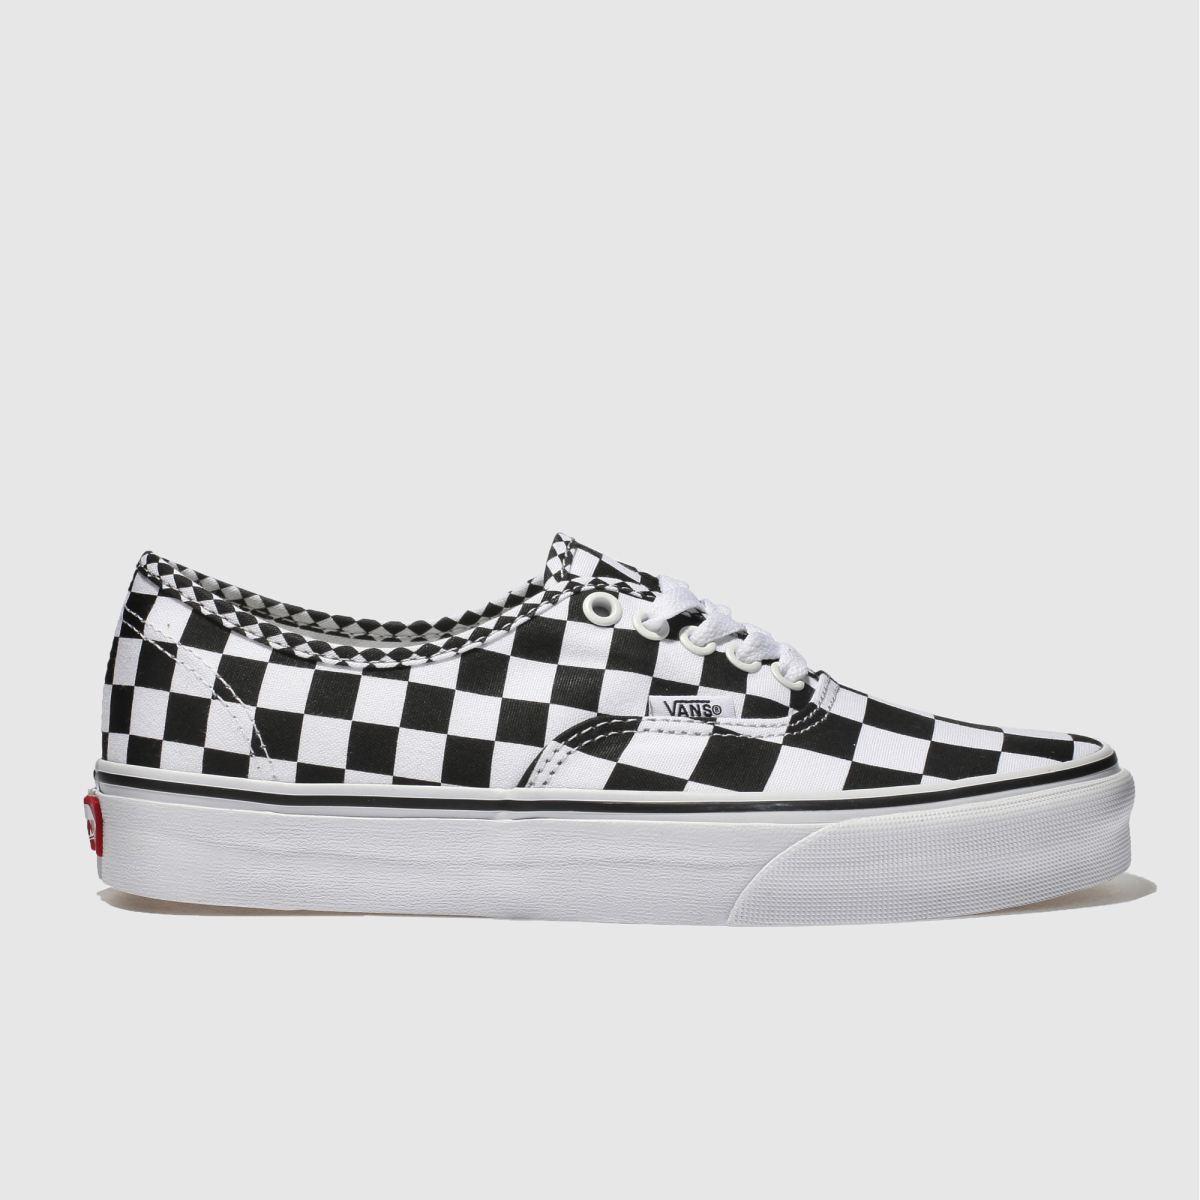 Vans White & Black Authentic Mix Checker Trainers